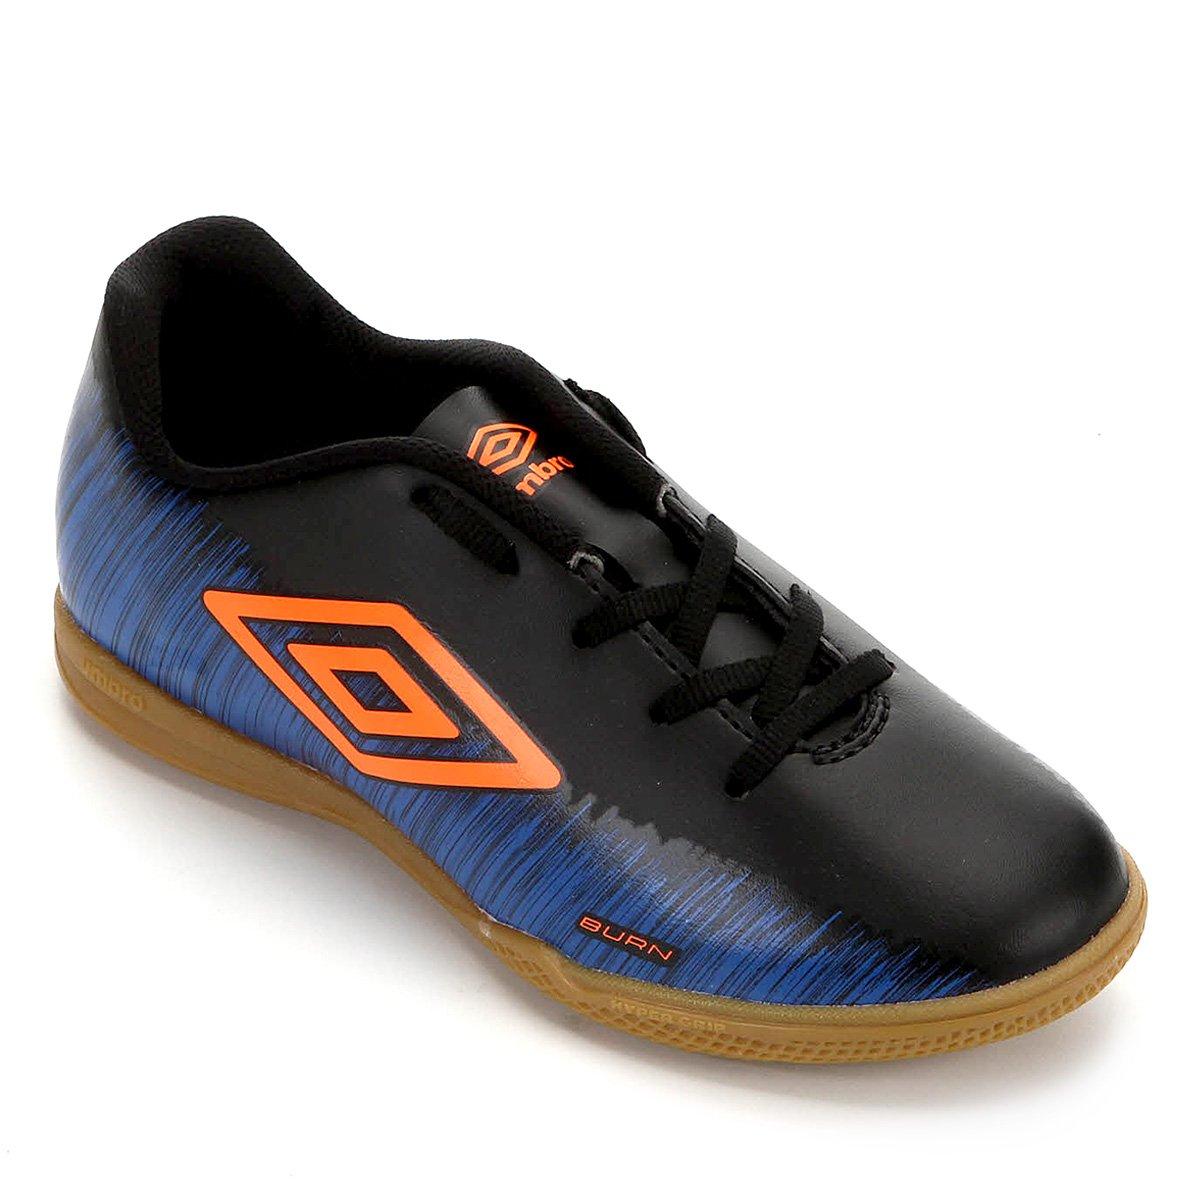 Chuteira Umbro Futsal Footwear Burn